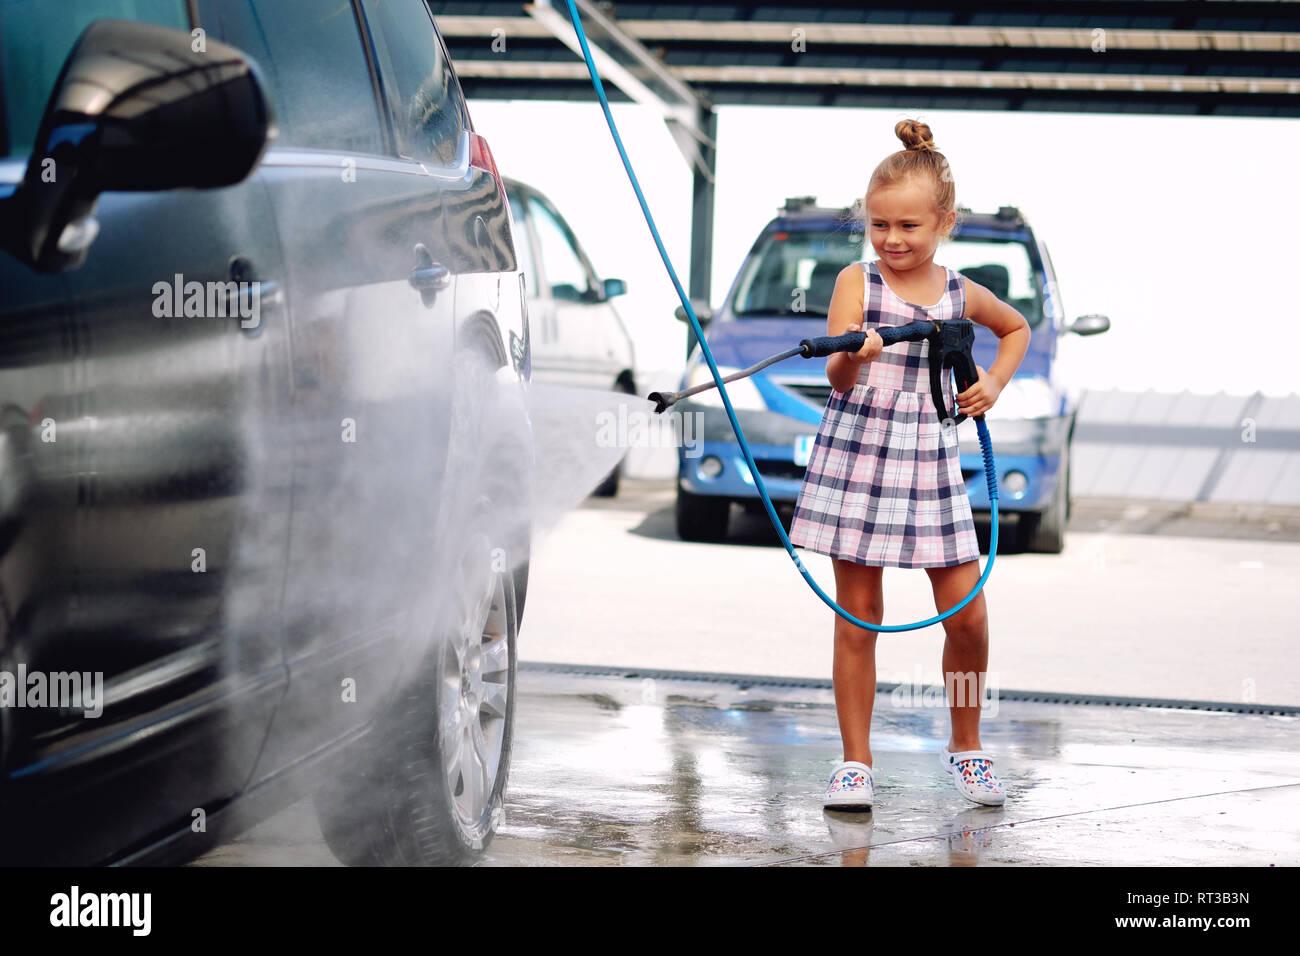 Lovely little preschool girl in summer dress helping to